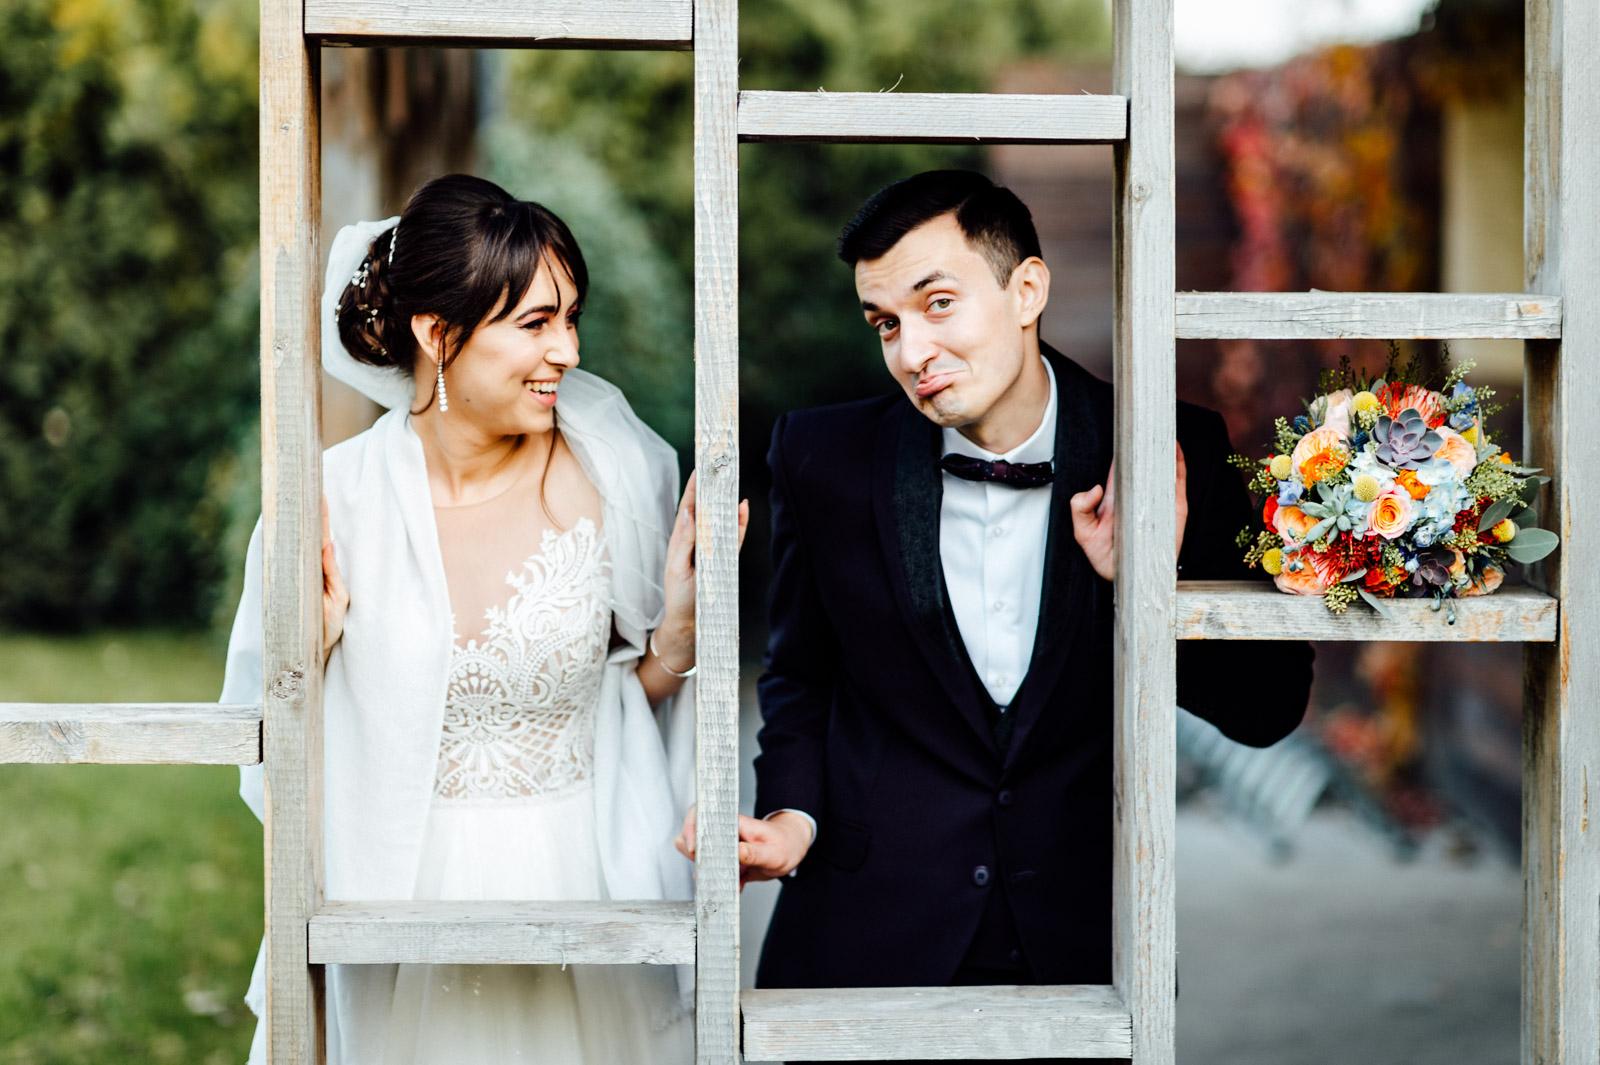 Fotografie documentara de nunta fotograf profesionist Dana Sacalov la Gradina Floreasca